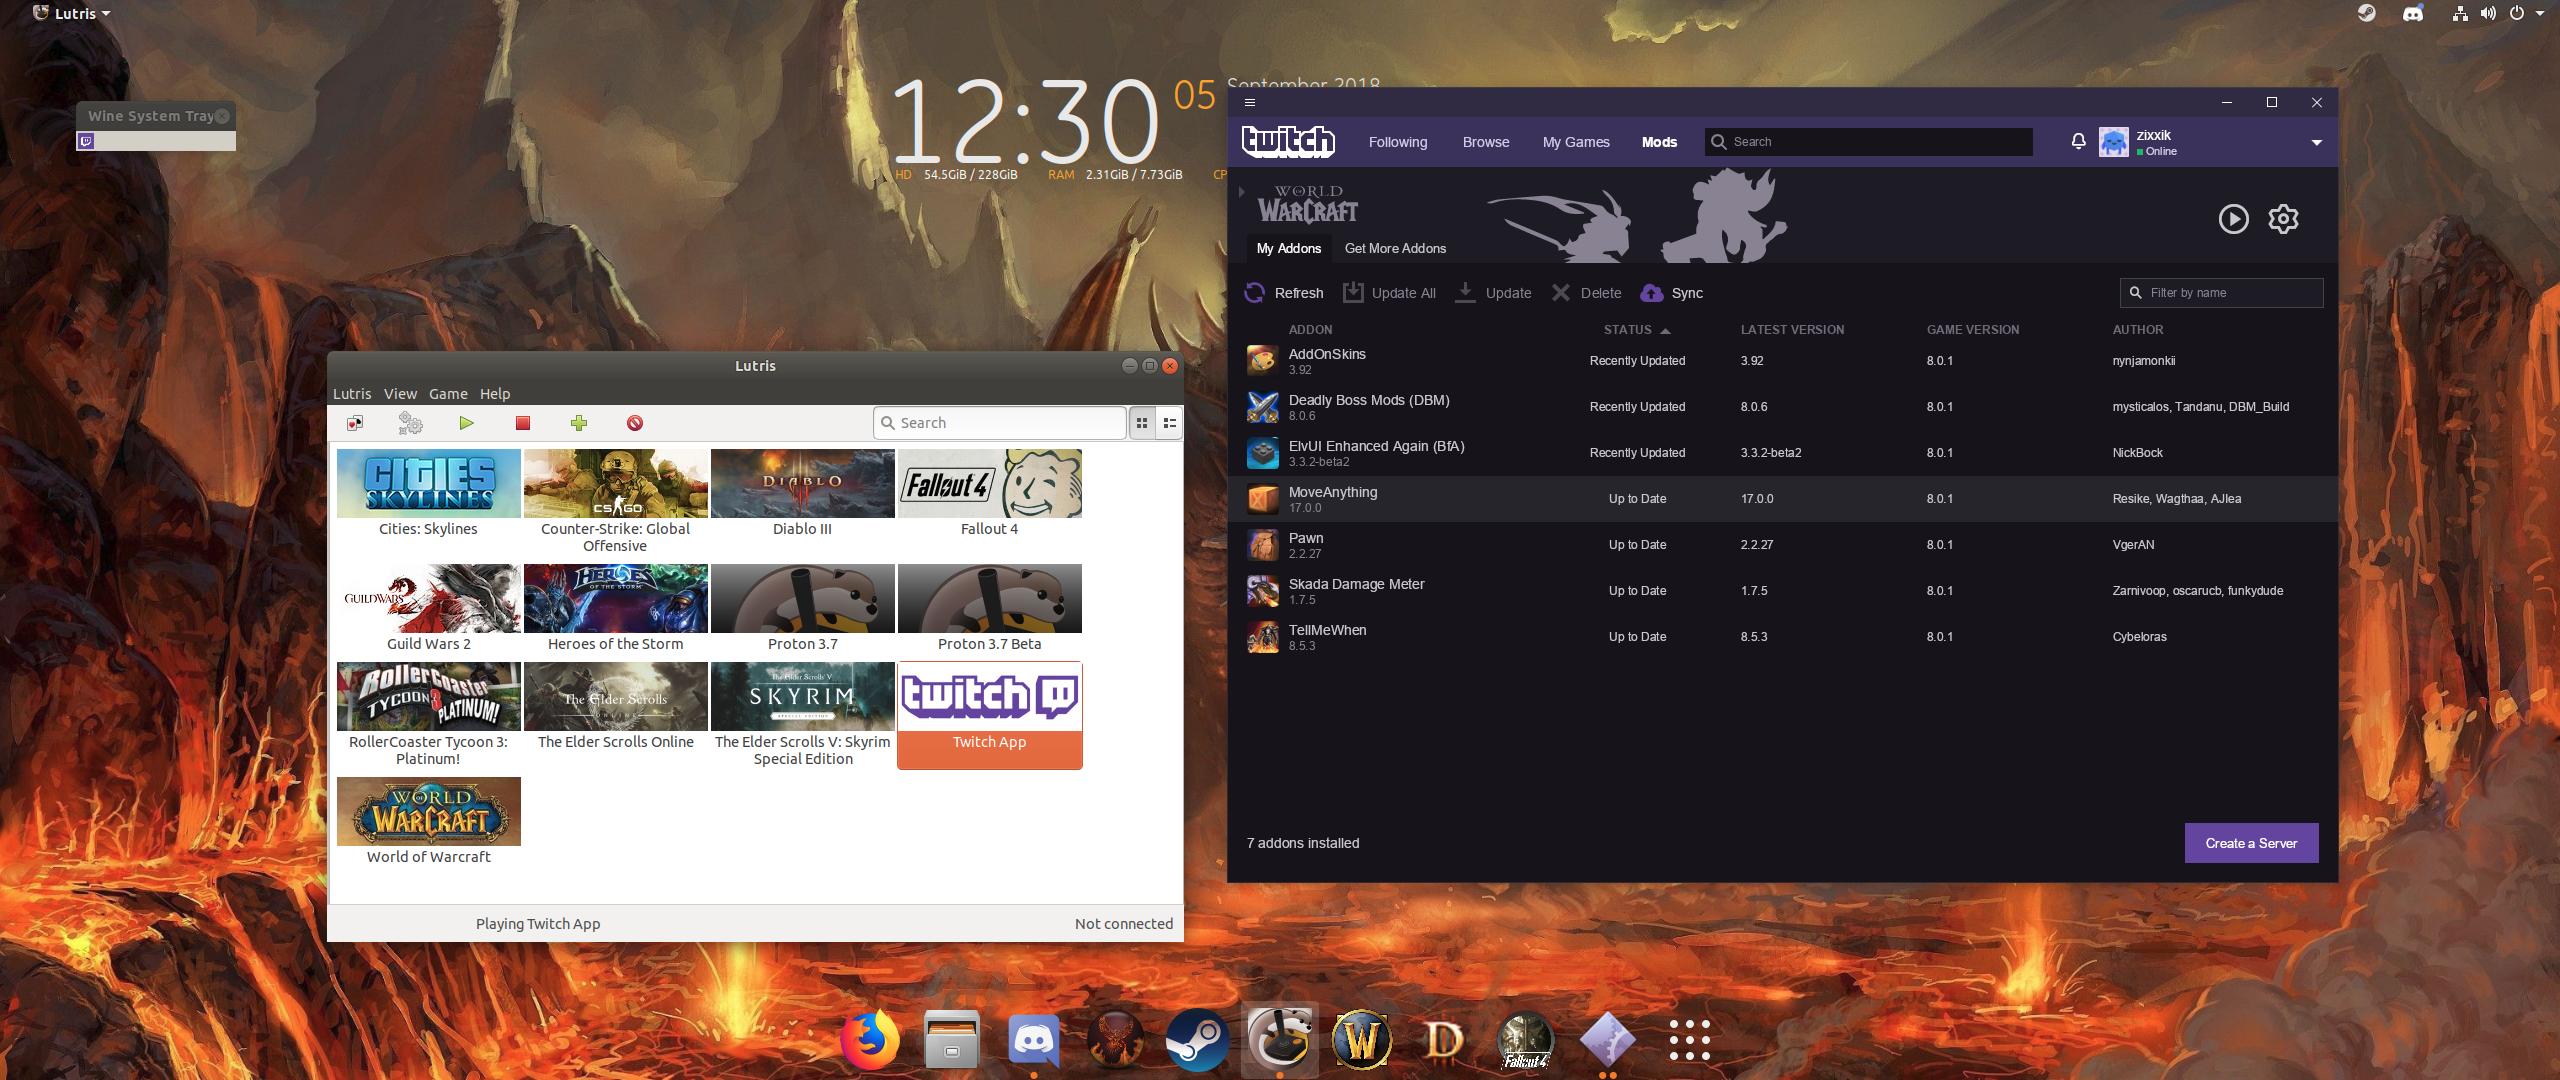 Twitch App - Lutris